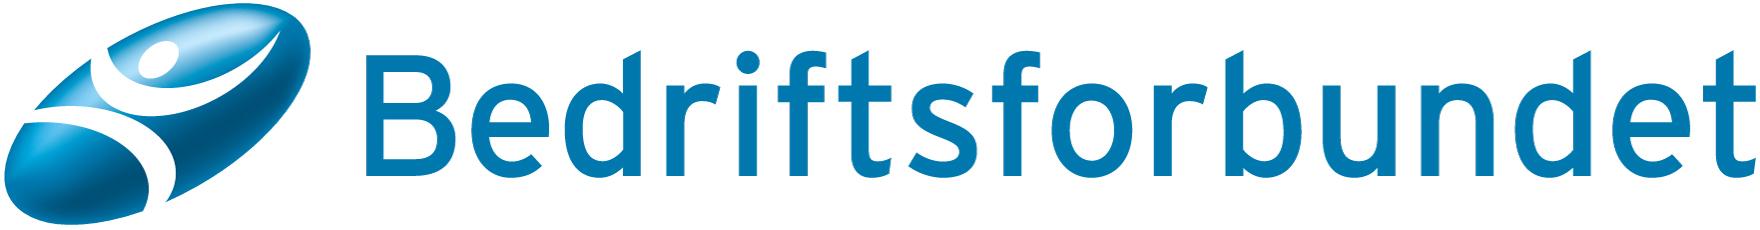 Bedriftsforbundet-logo-RGB-Stor.jpg